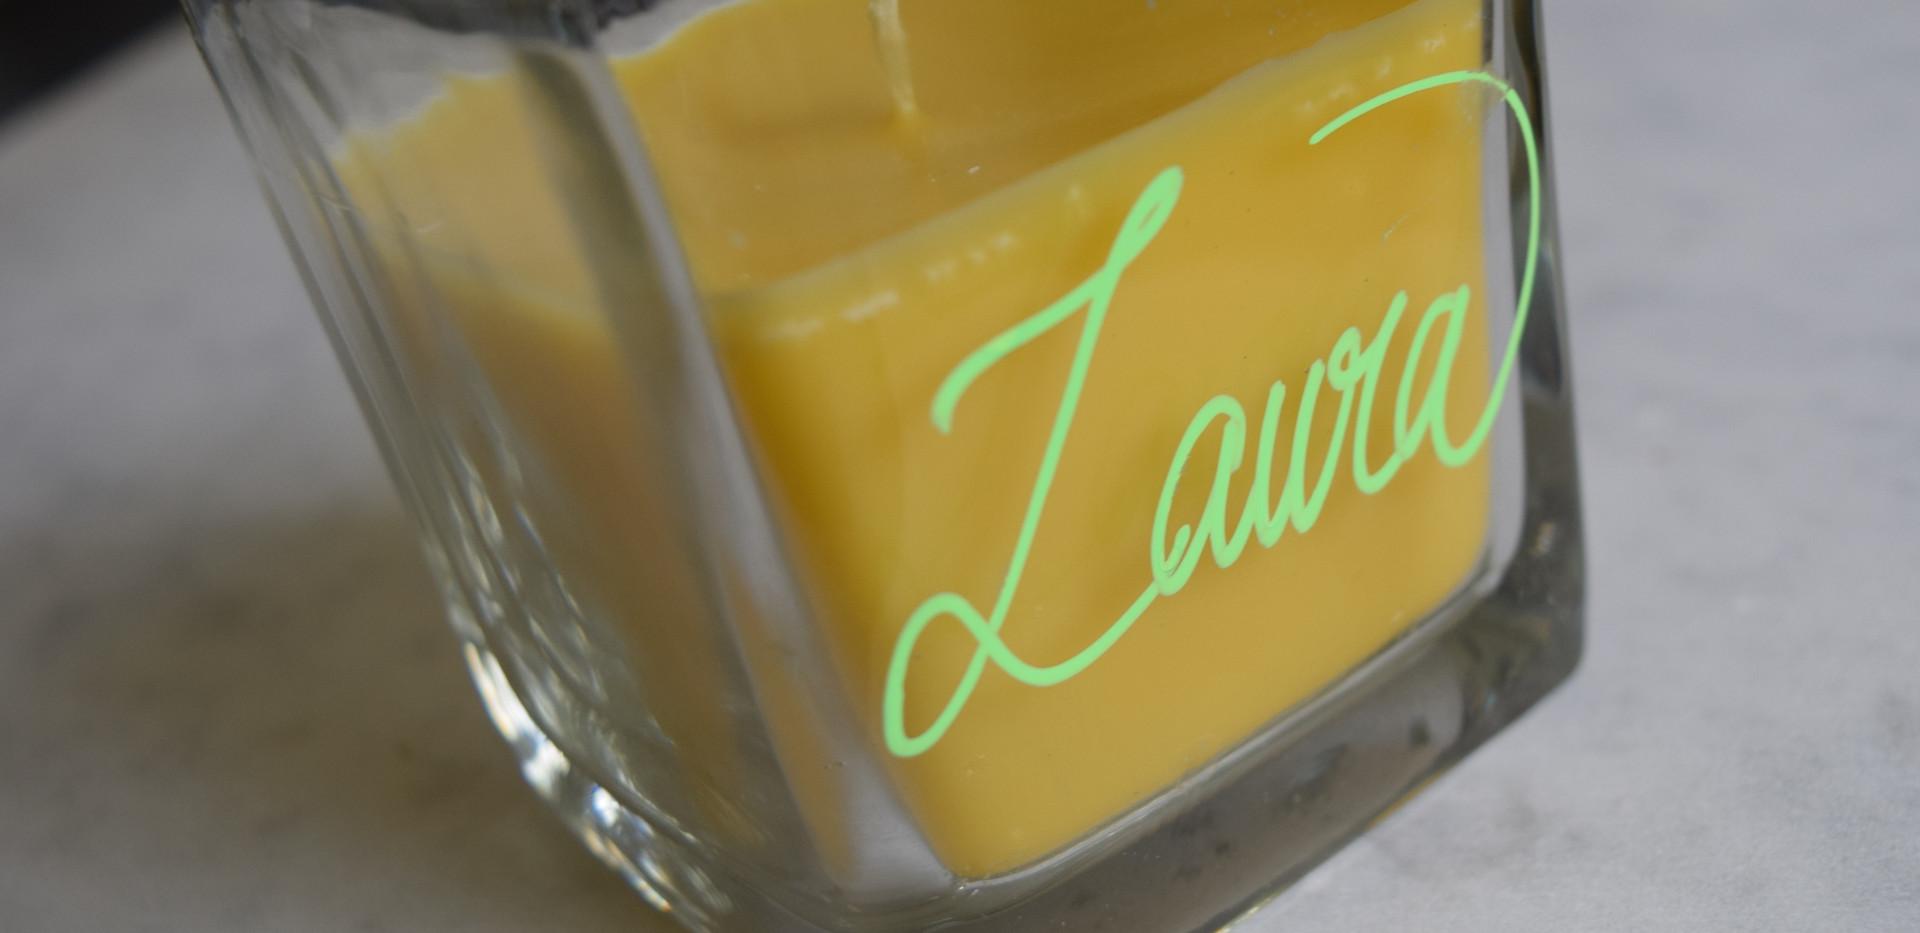 Lemon Candle Lime coloured ink